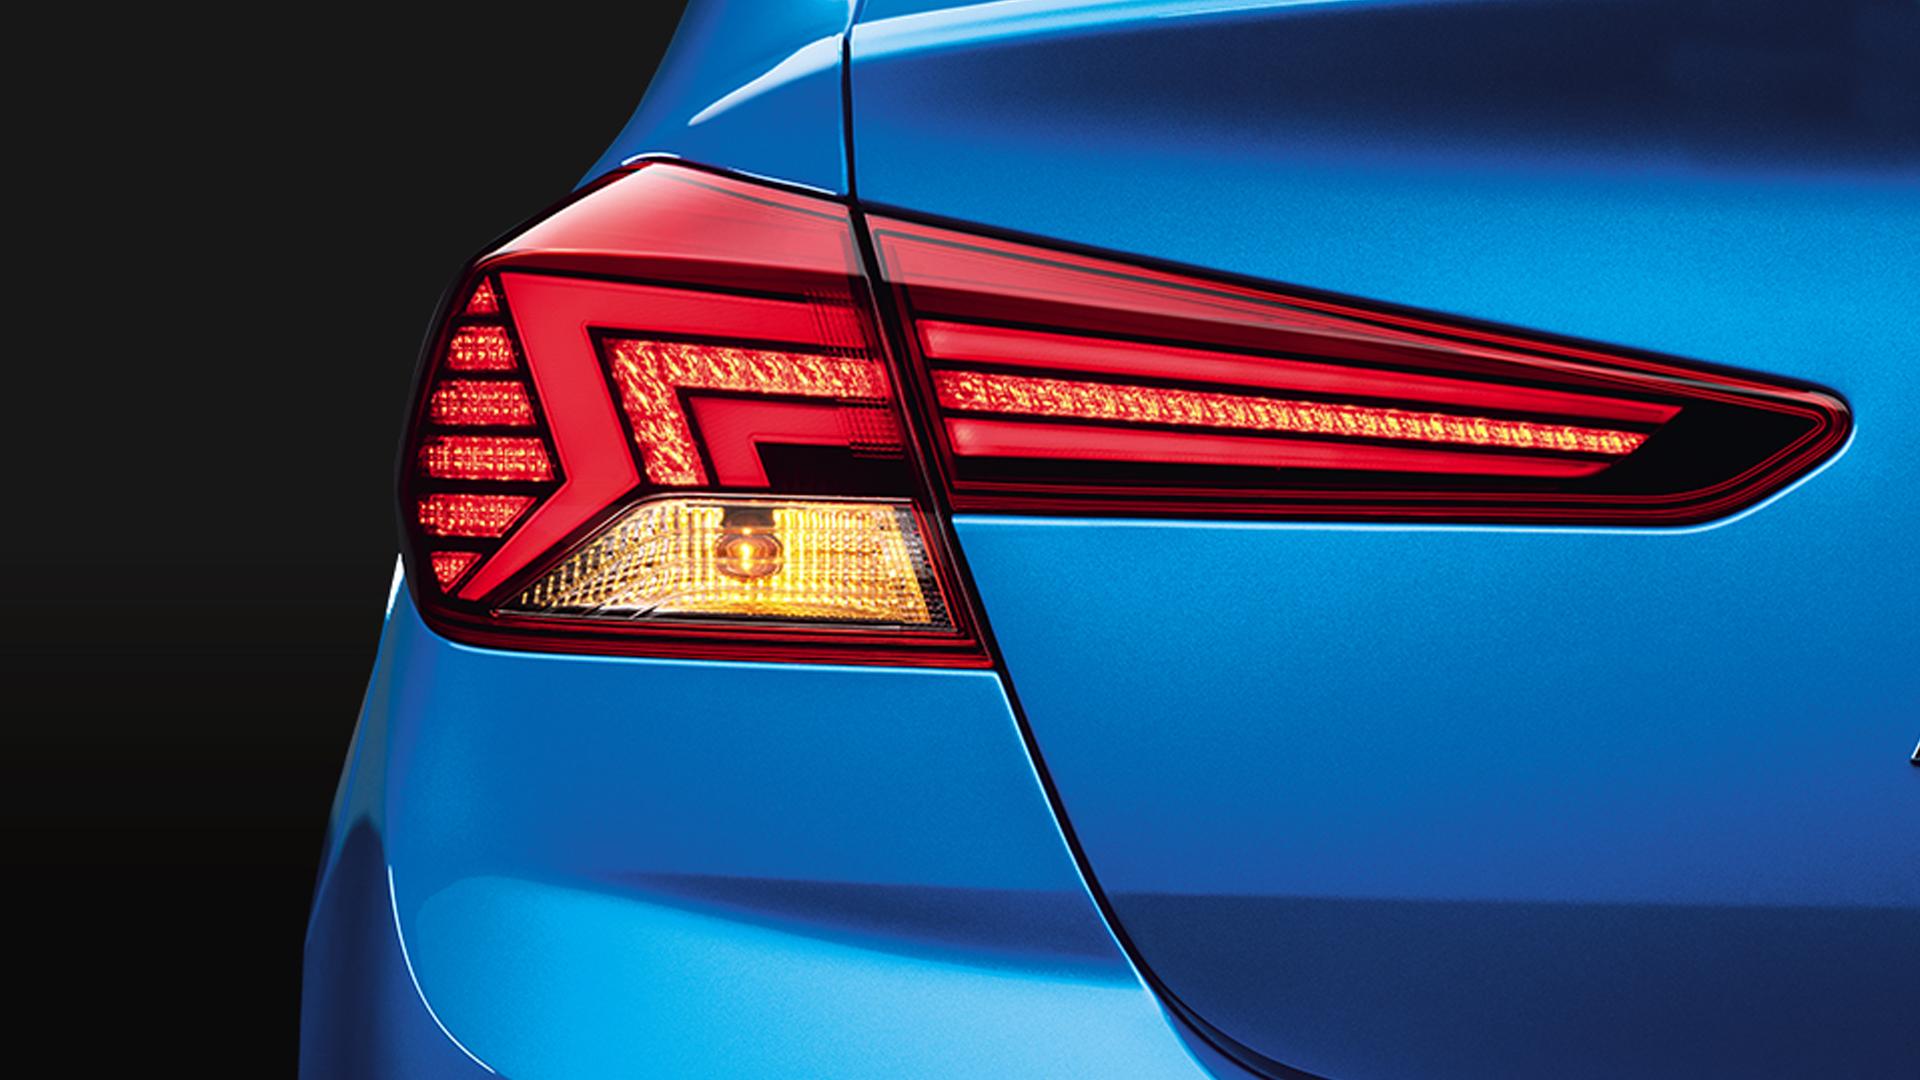 Hyundai Elantra 2020 1.5 Diesel SX Exterior